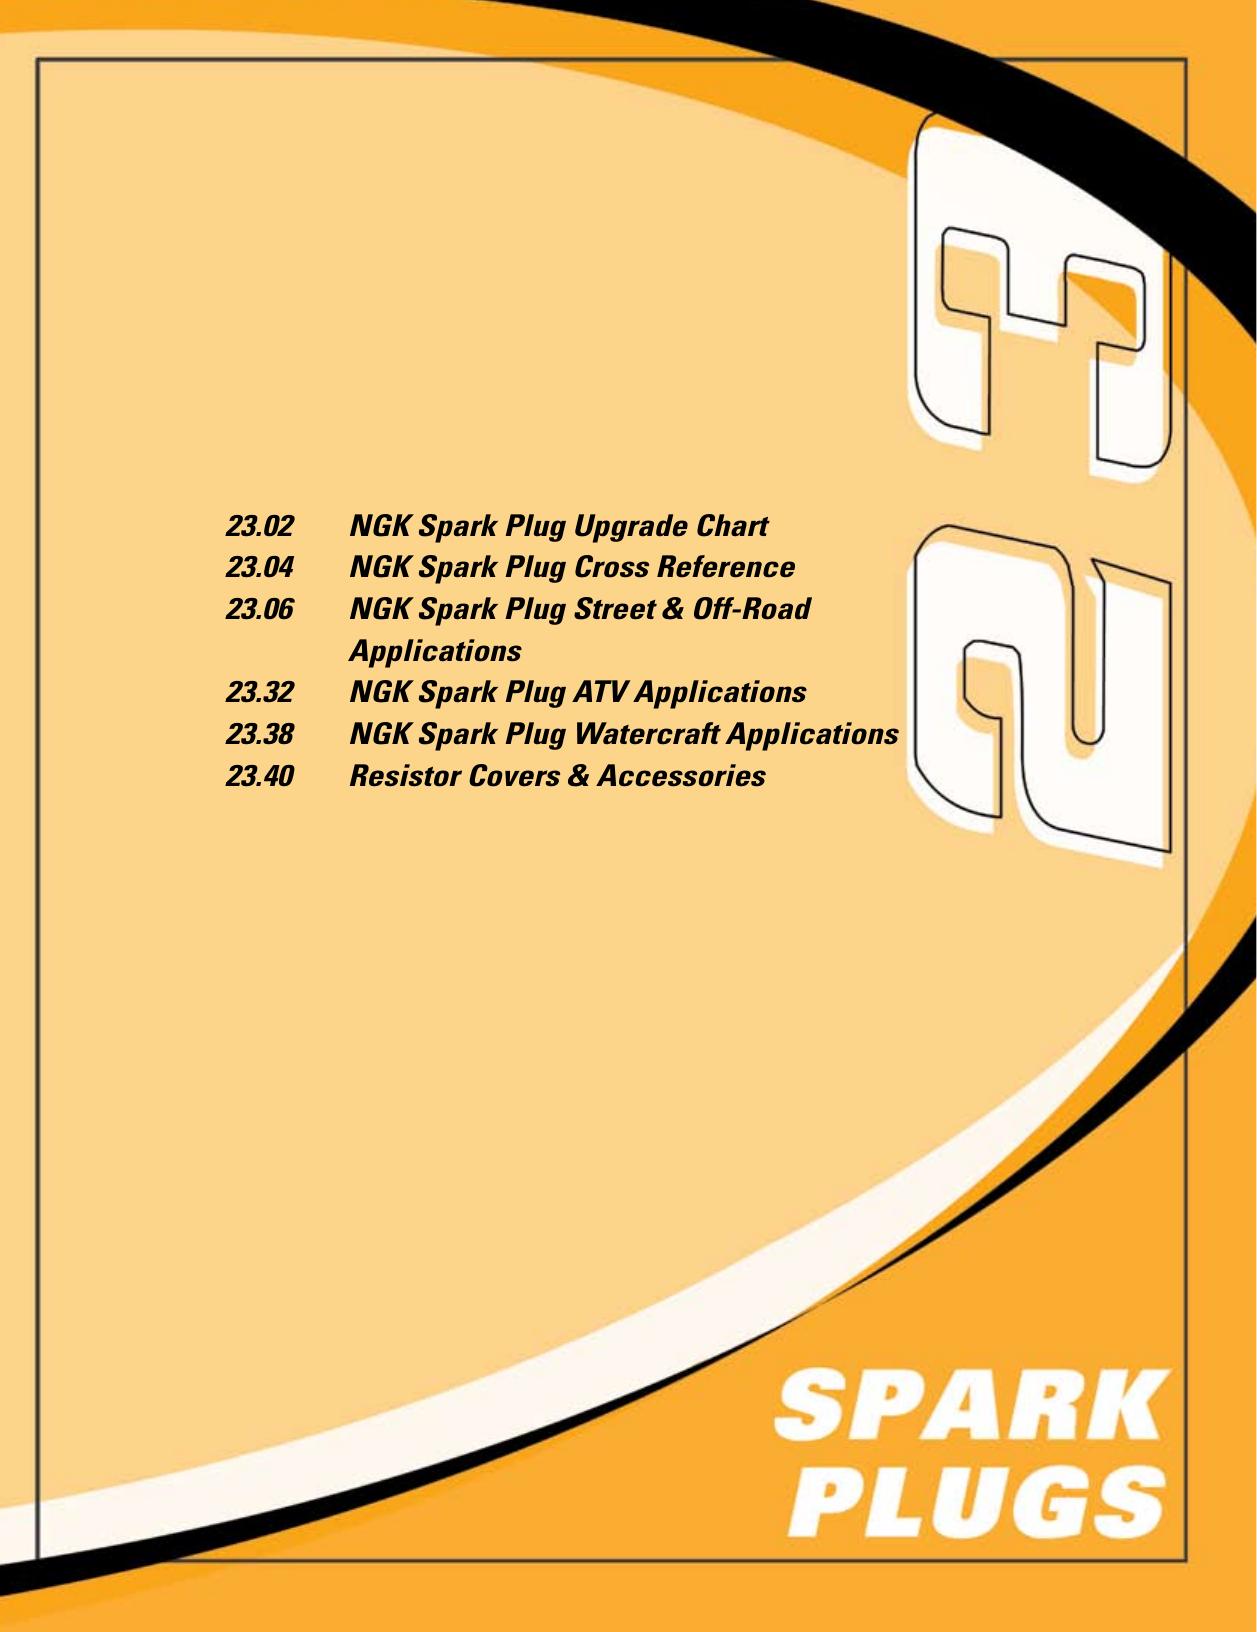 23 02 NGK Spark Plug Upgrade Chart 23 04 NGK Spark Plug